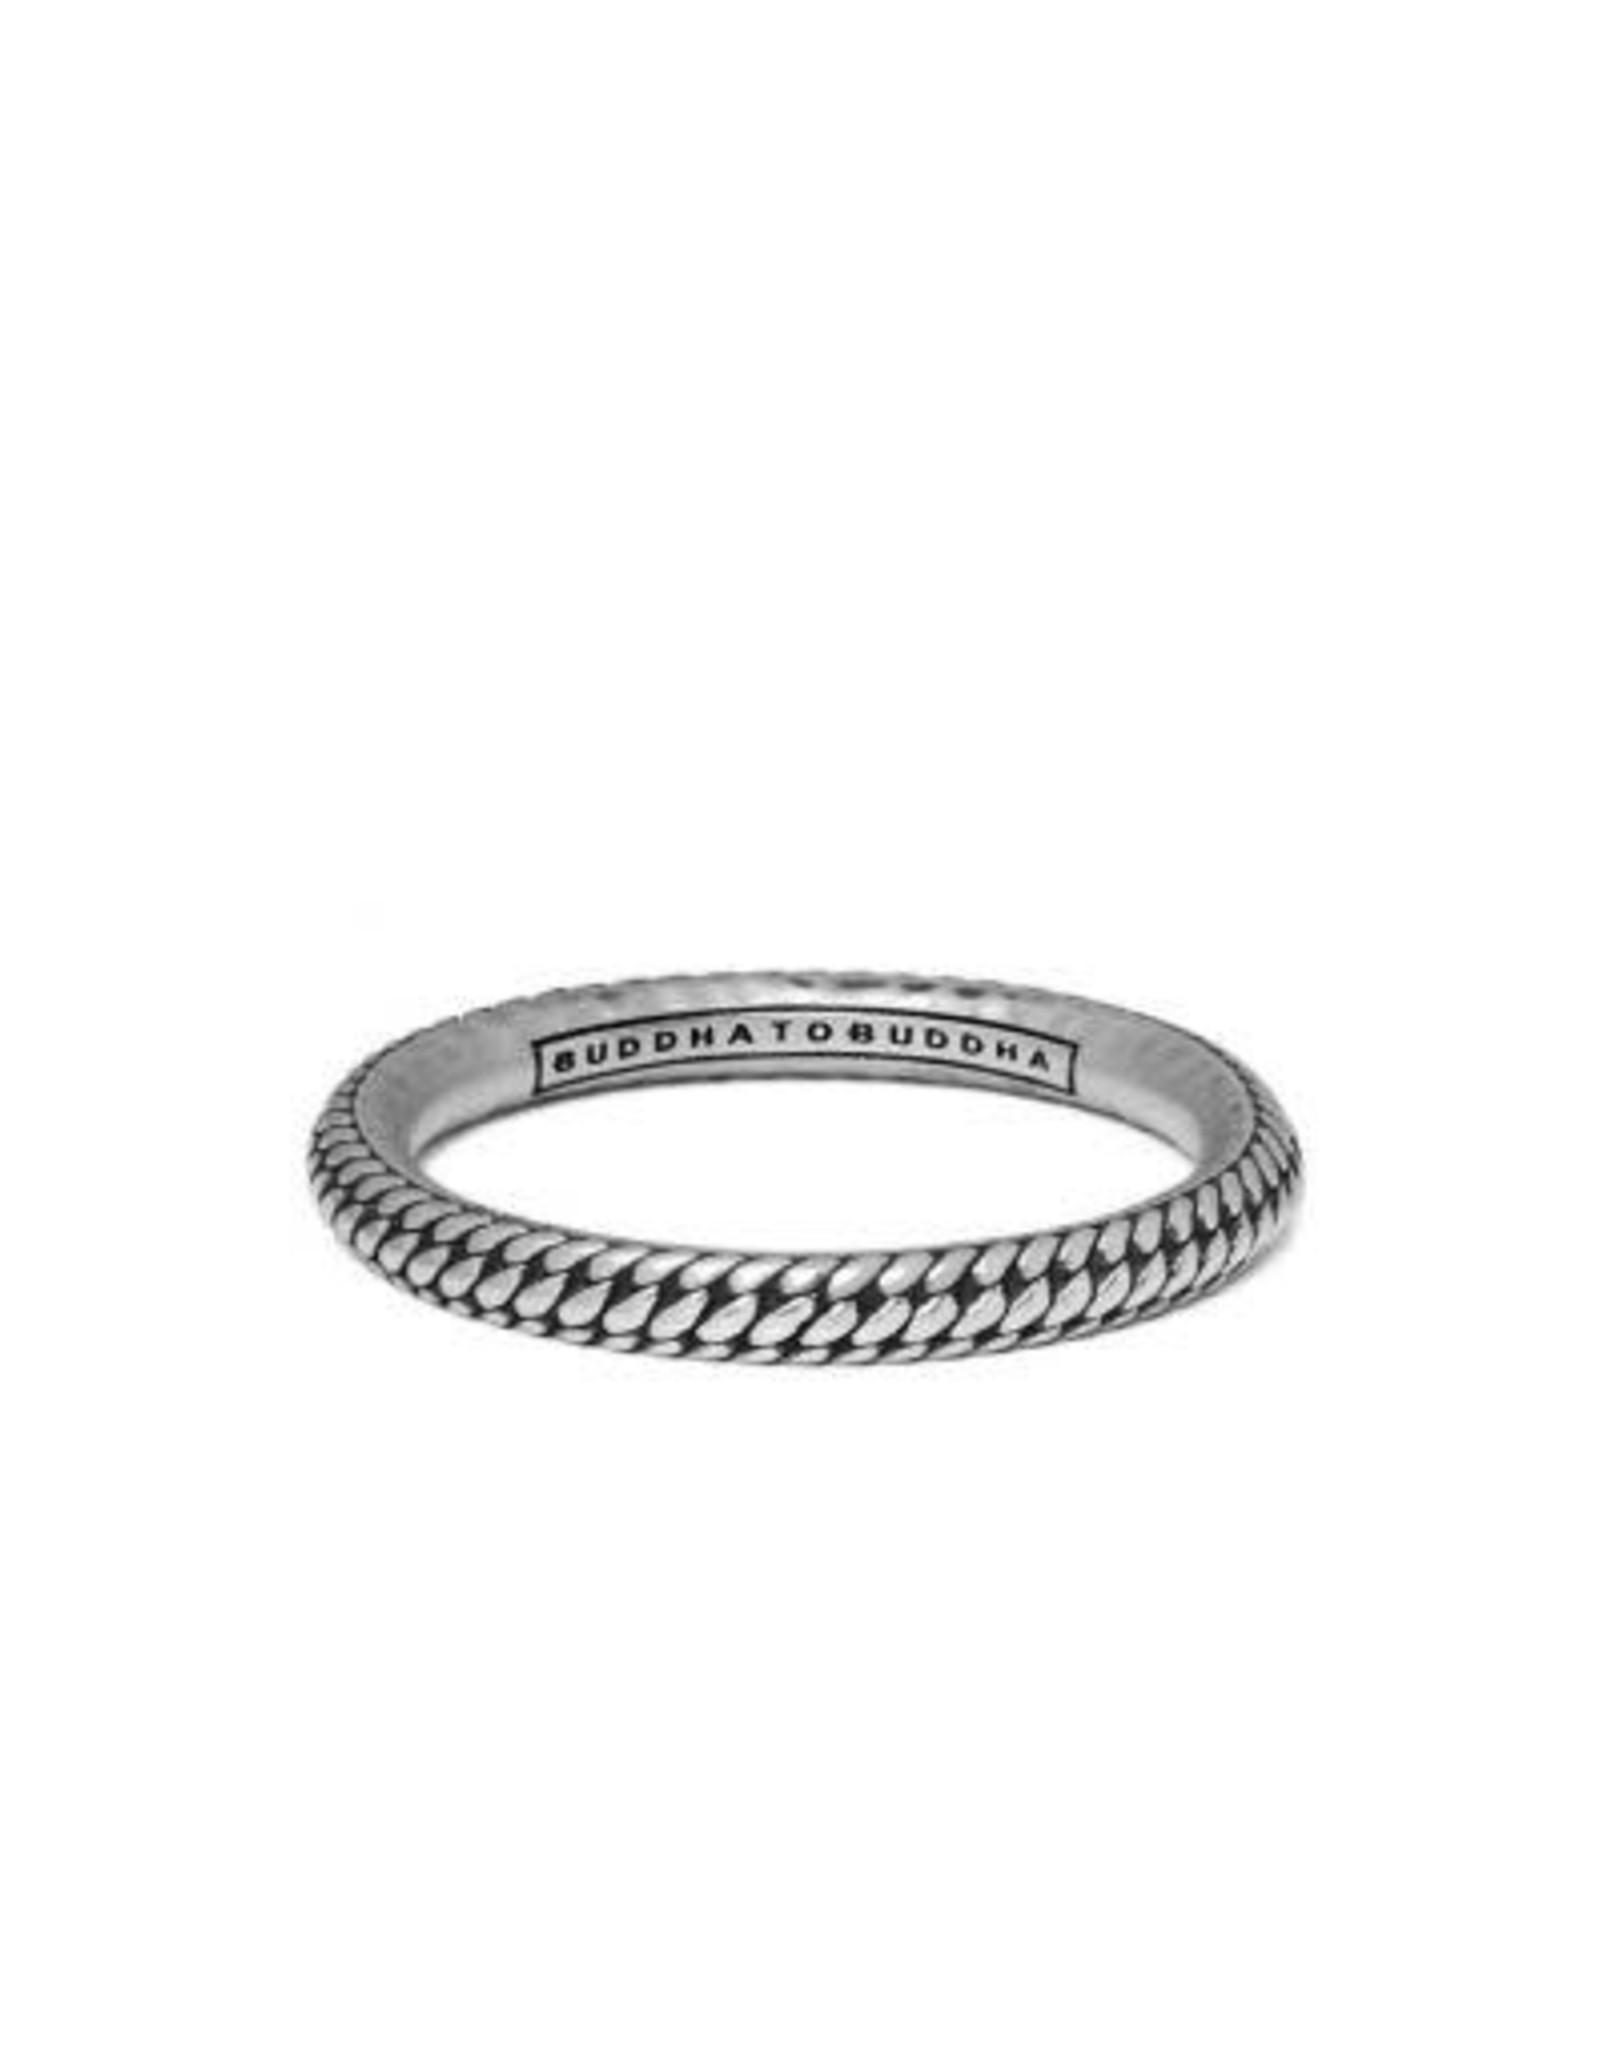 Buddha to Buddha 925 Sterling Zilveren 325 Dunia Ben Ring